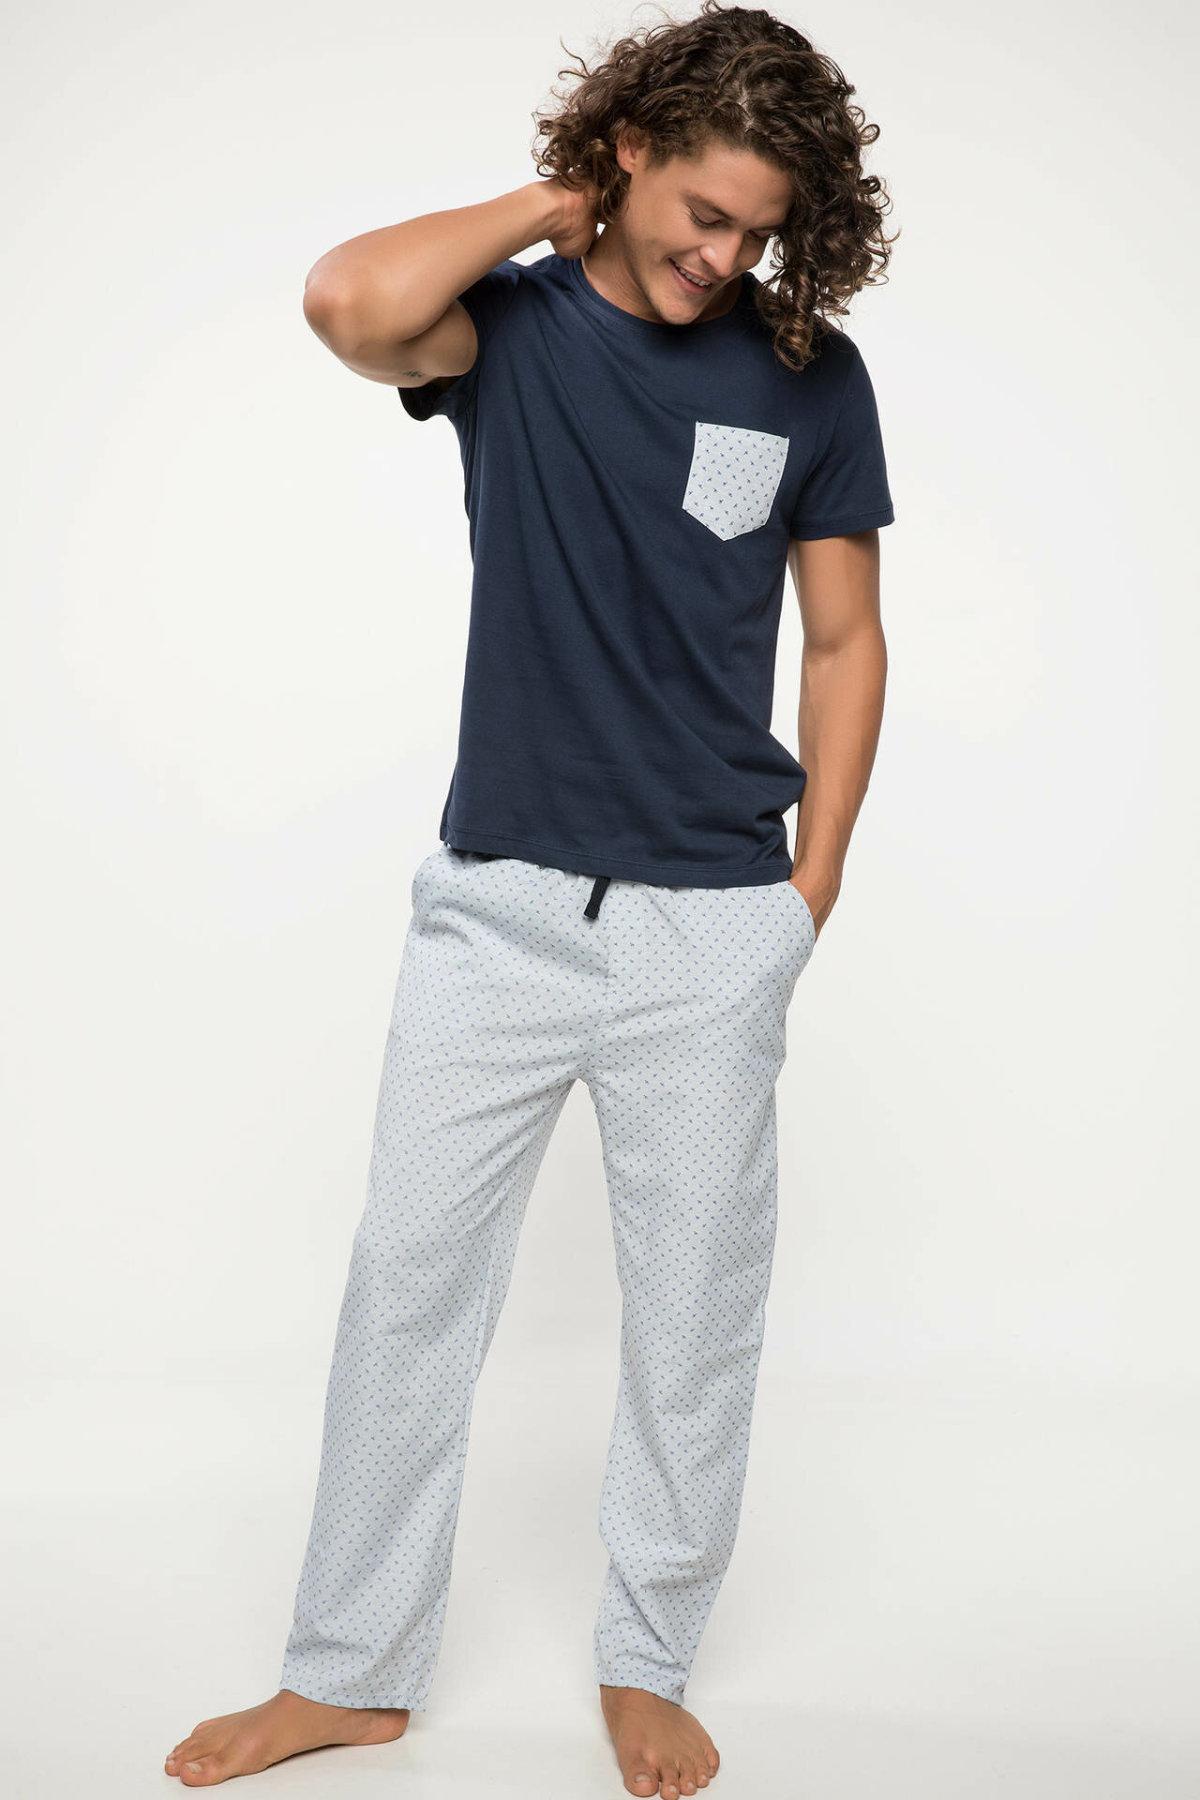 DeFacto Man Knitted Pajamas Sets Men Knitted Short Sleeve Tops Casual Long Pants Men's Homewear Sets-J6975AZ18AU